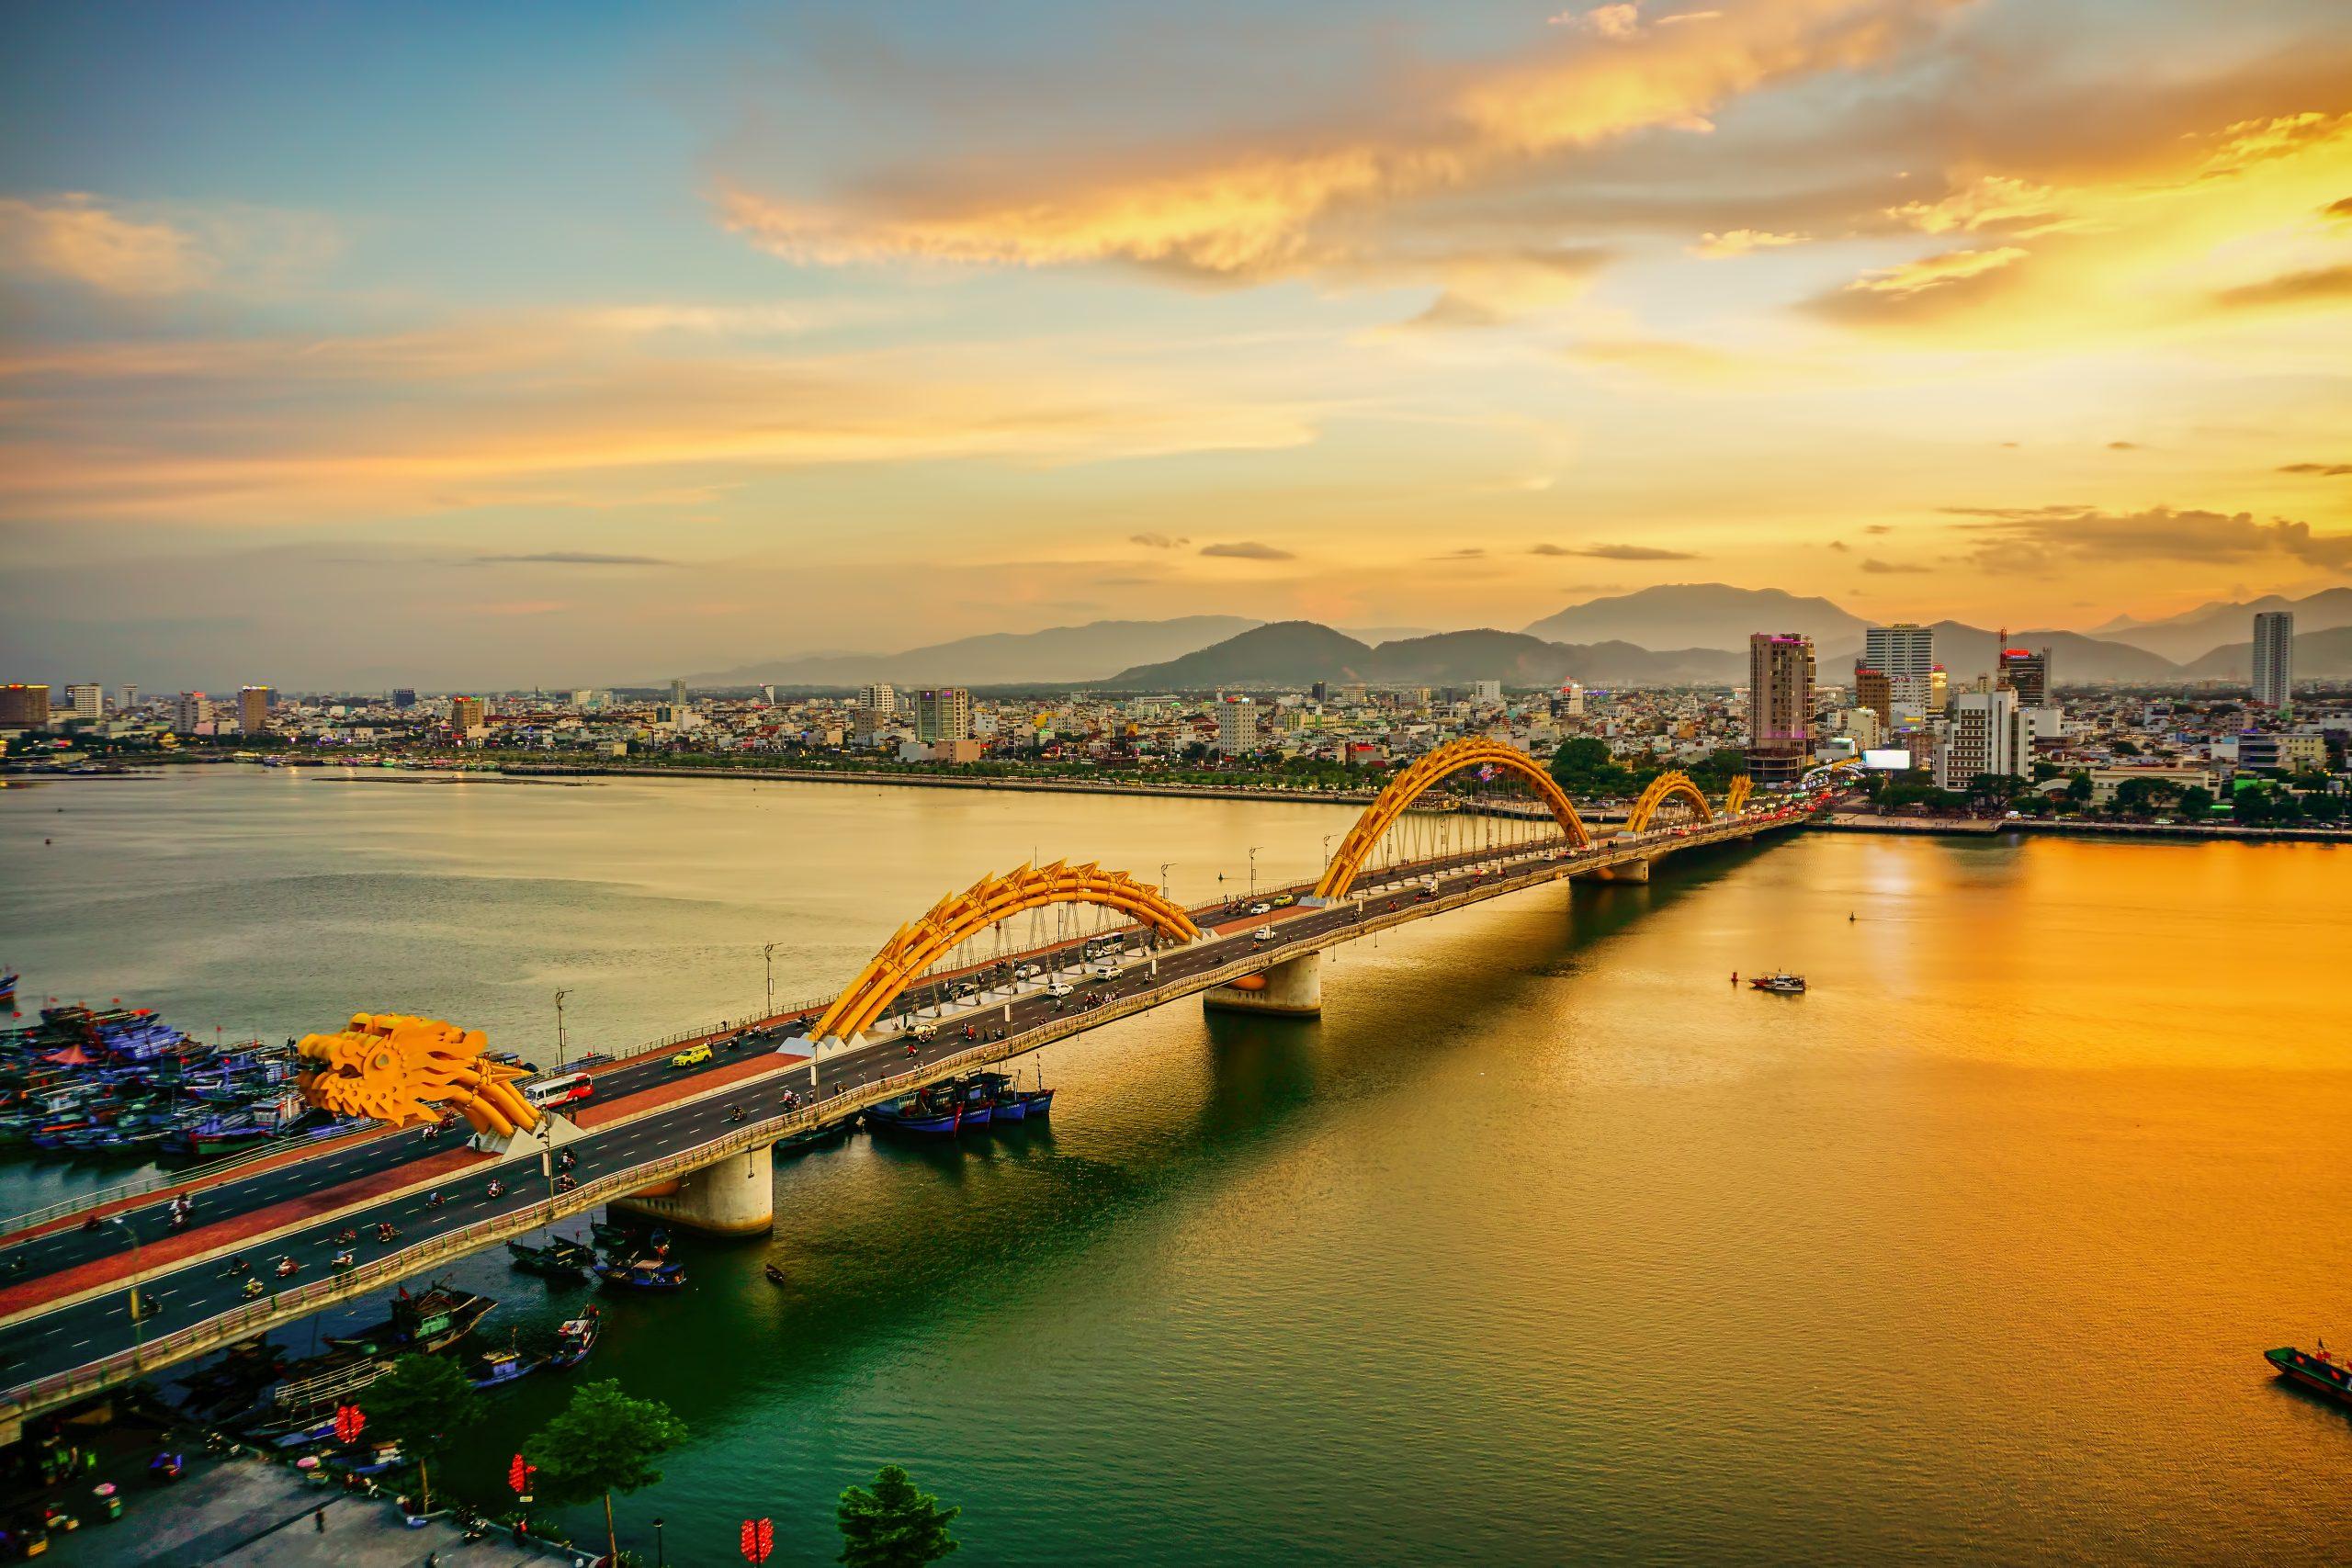 Iconic Dragon Bridge Crossing The Han River In Danag